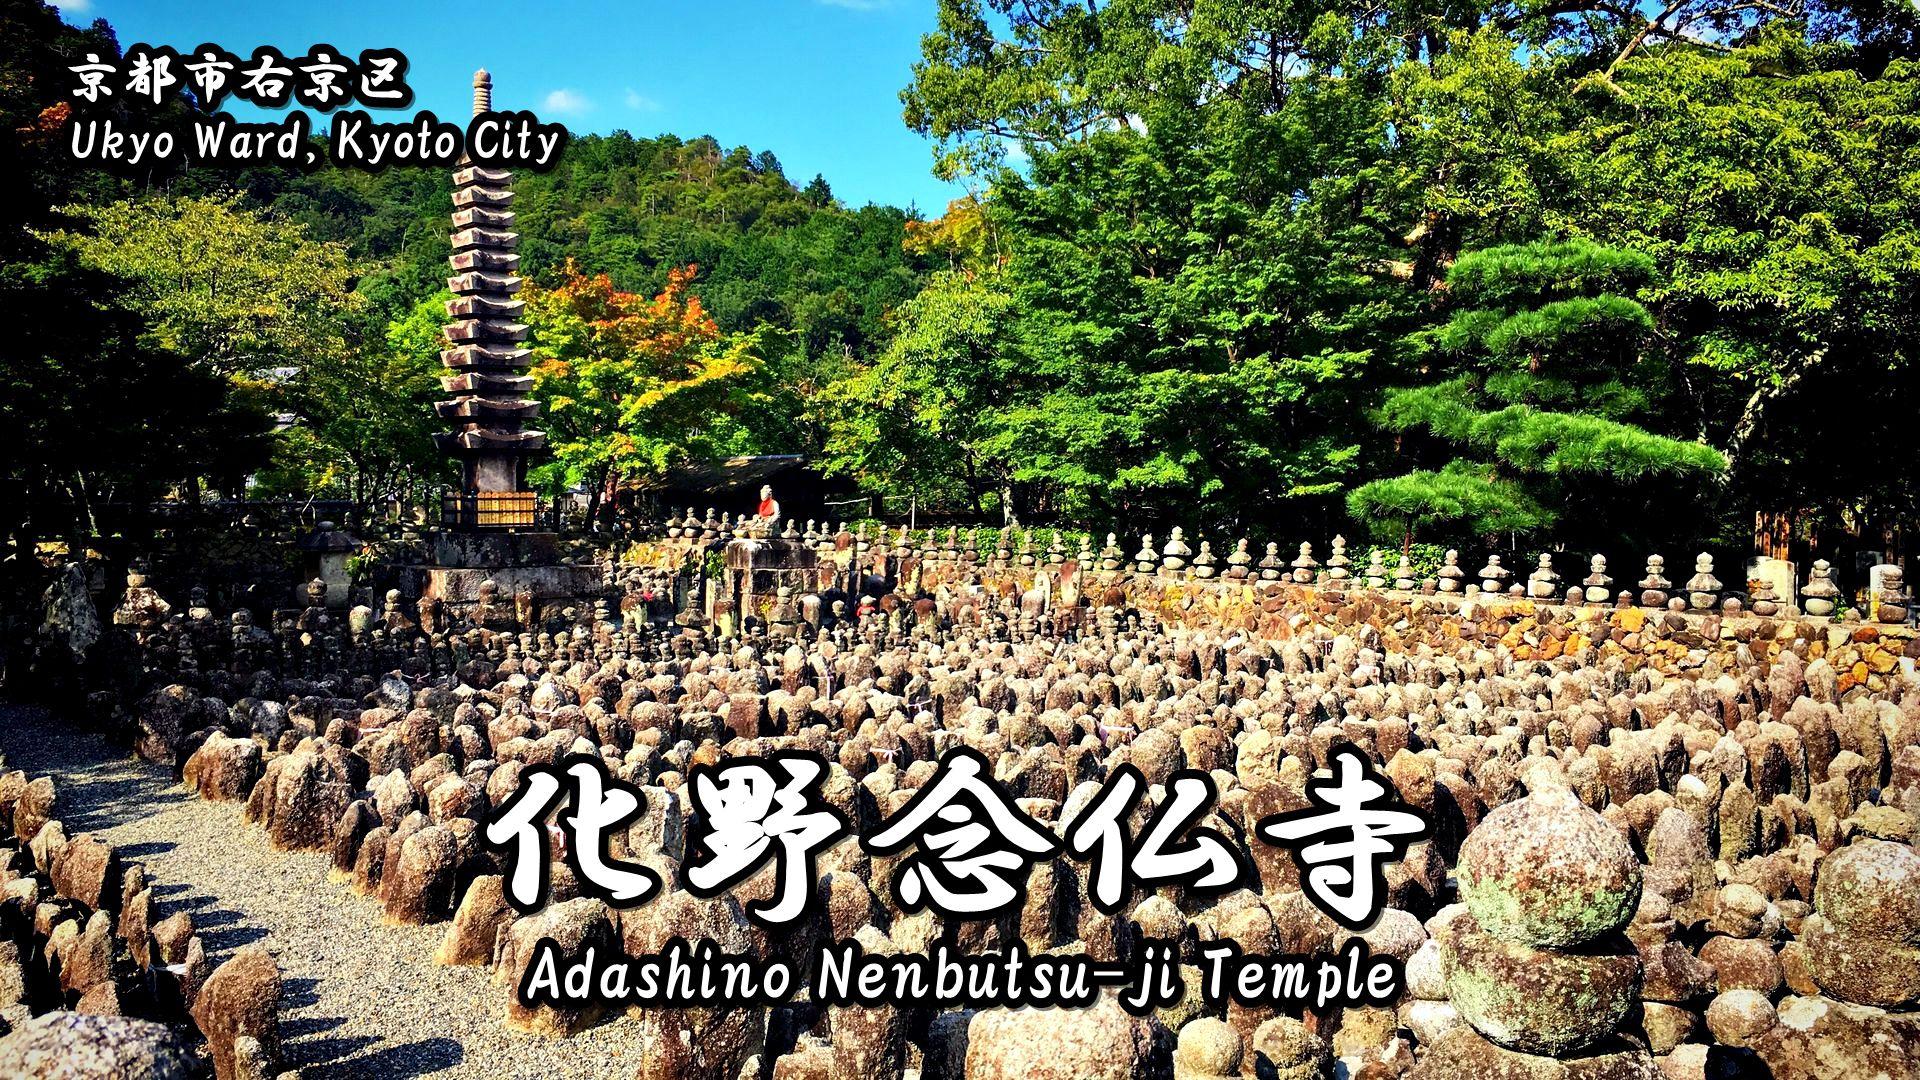 adashnonebutsuji-txt-05